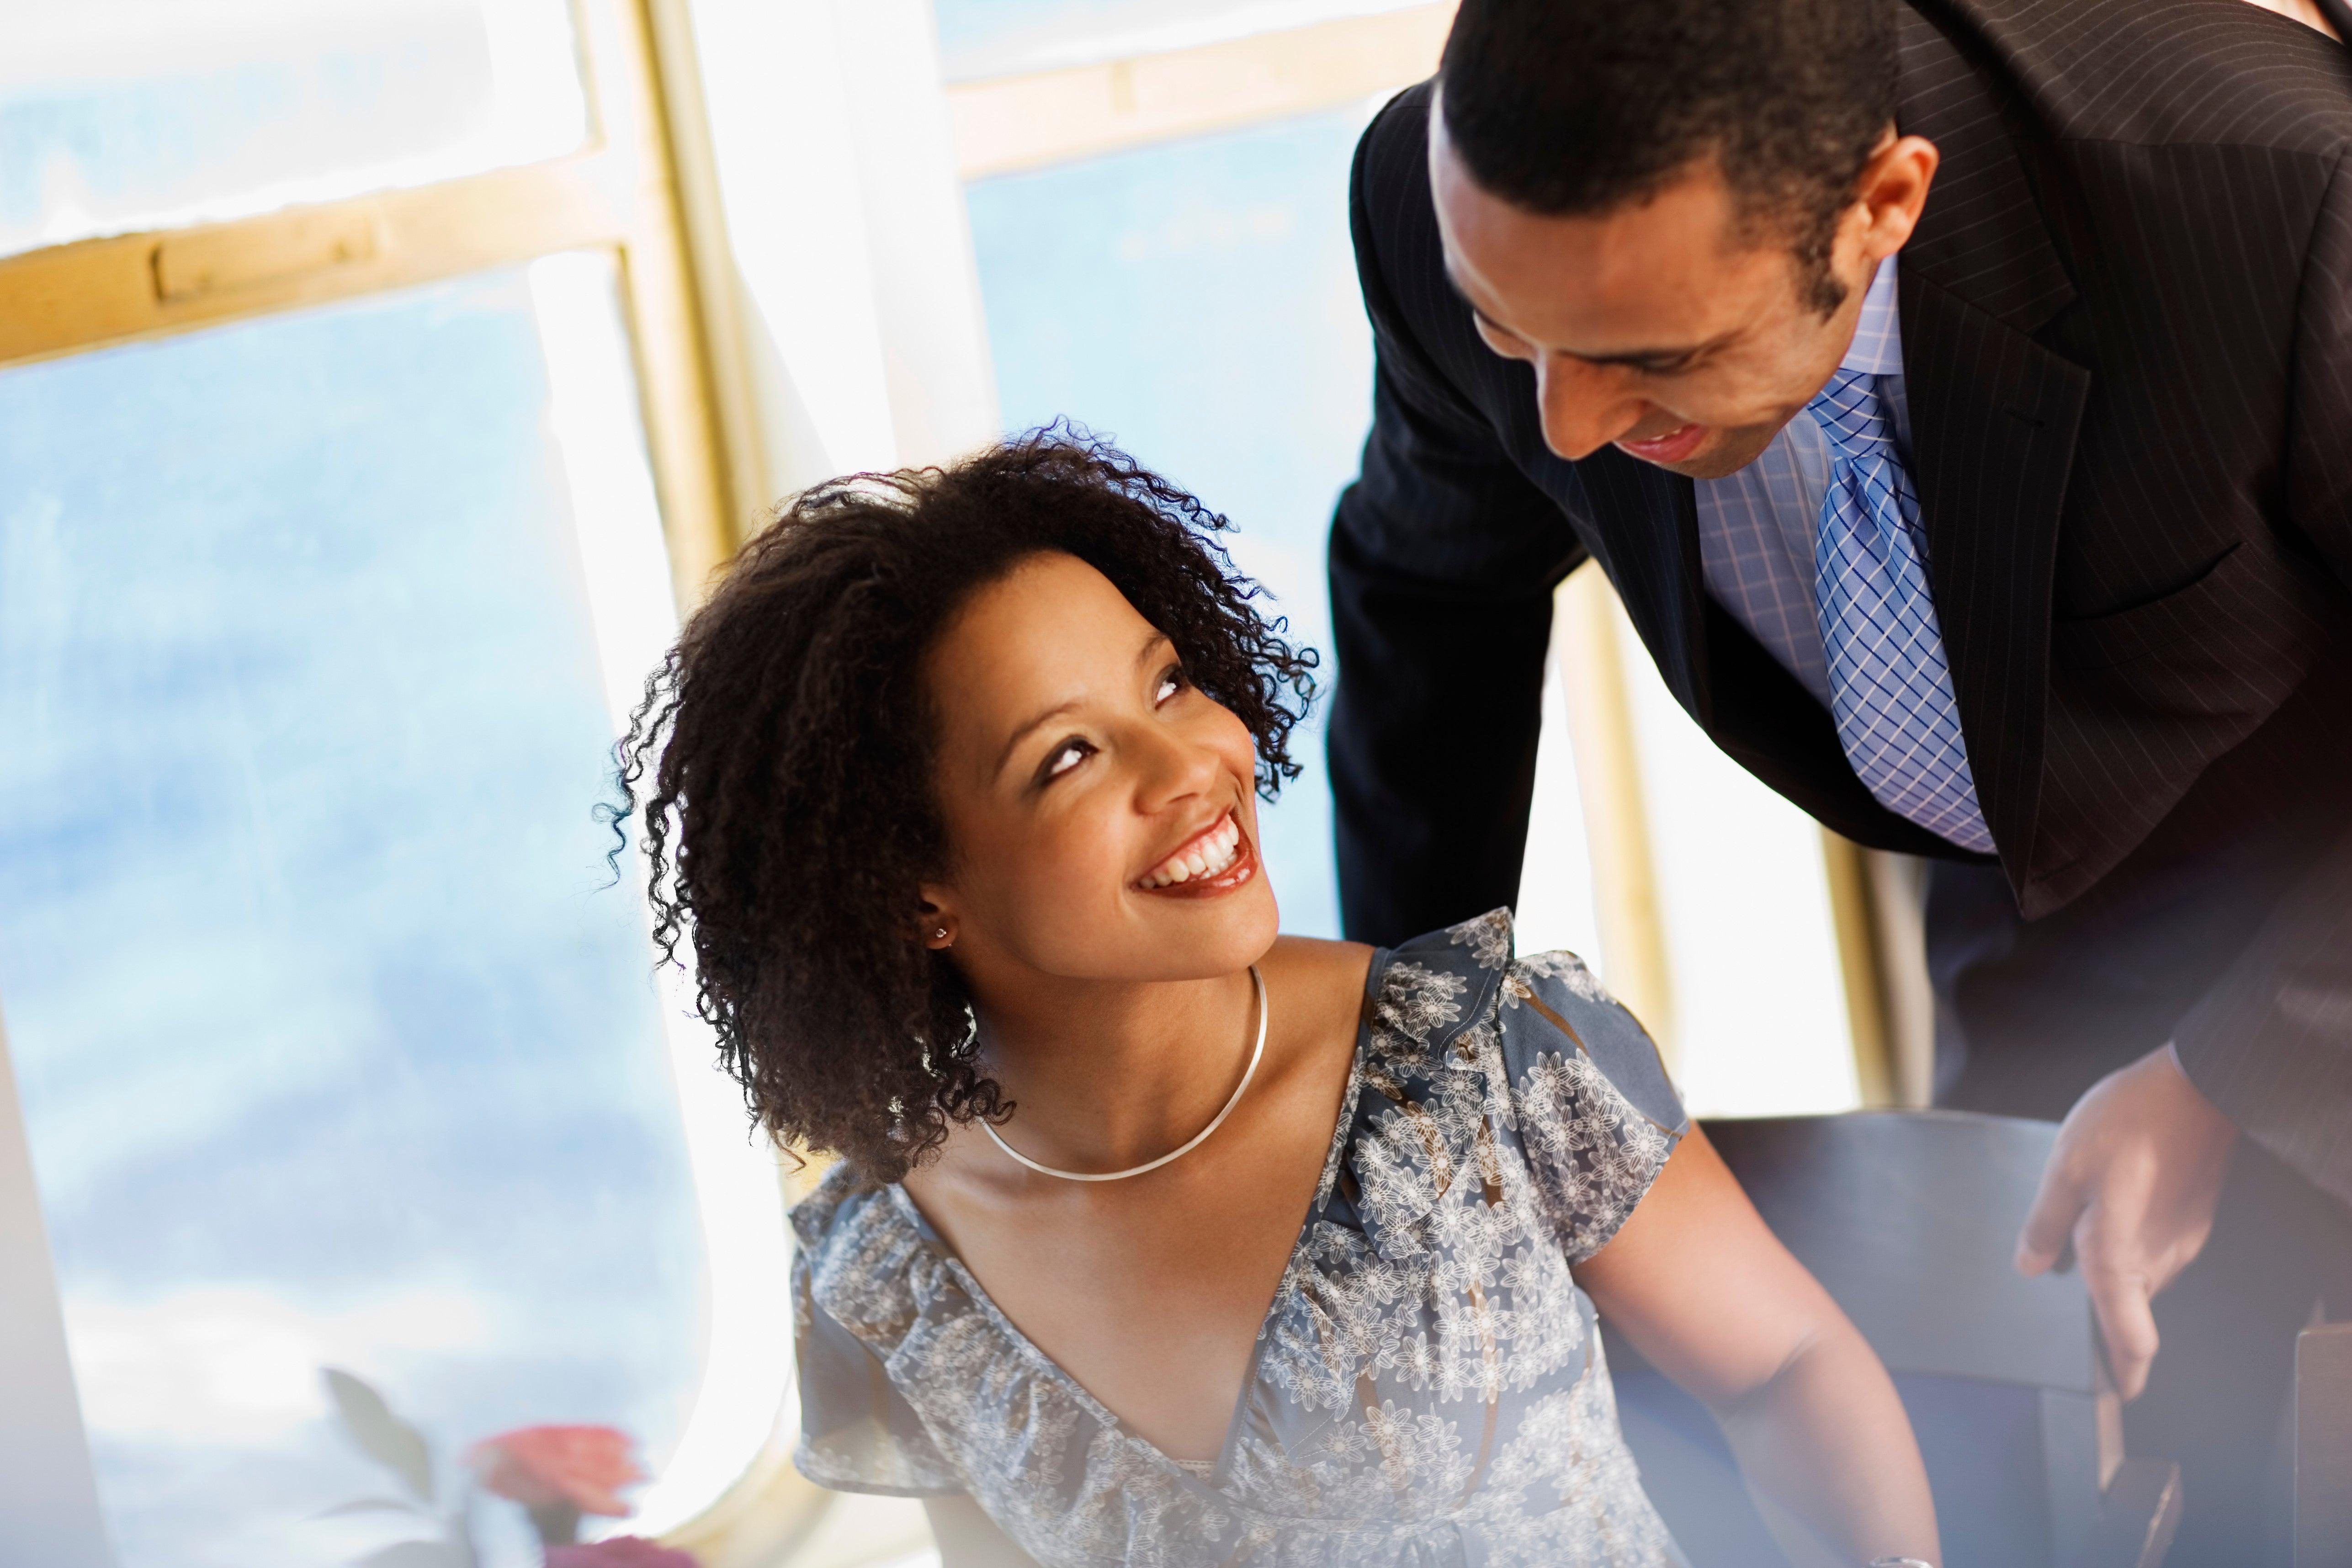 Balancing Act: Should Women Pay Their Way?